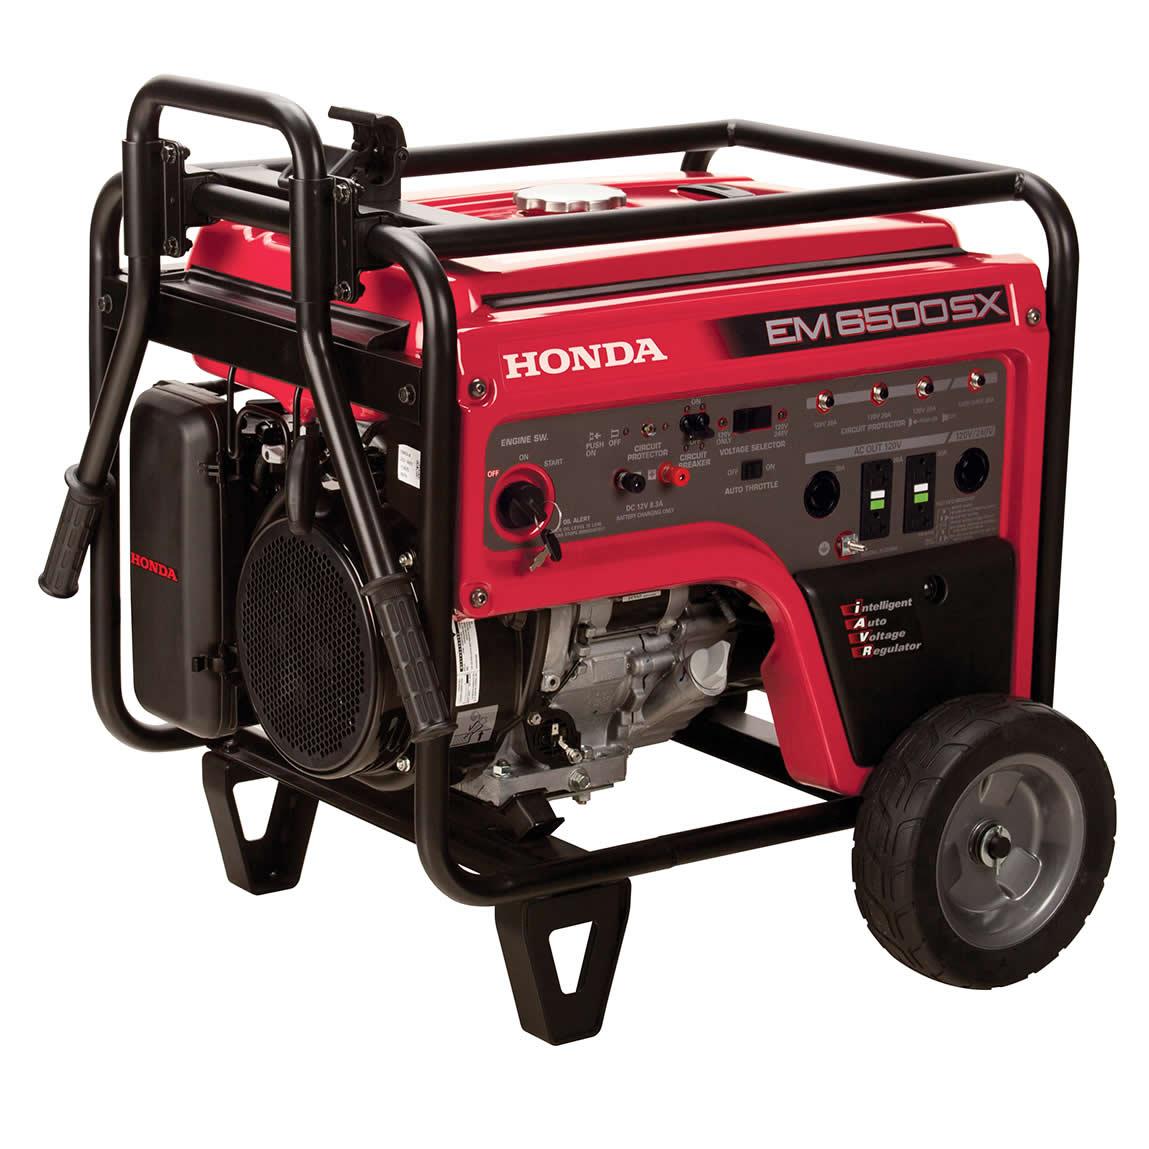 Picture of Honda EM Series EM6500SX21 Portable Generator, 45.8/22.9 A, 120/240 V, Gasoline, 6.2 gal Tank, 6.9 hr Run Time